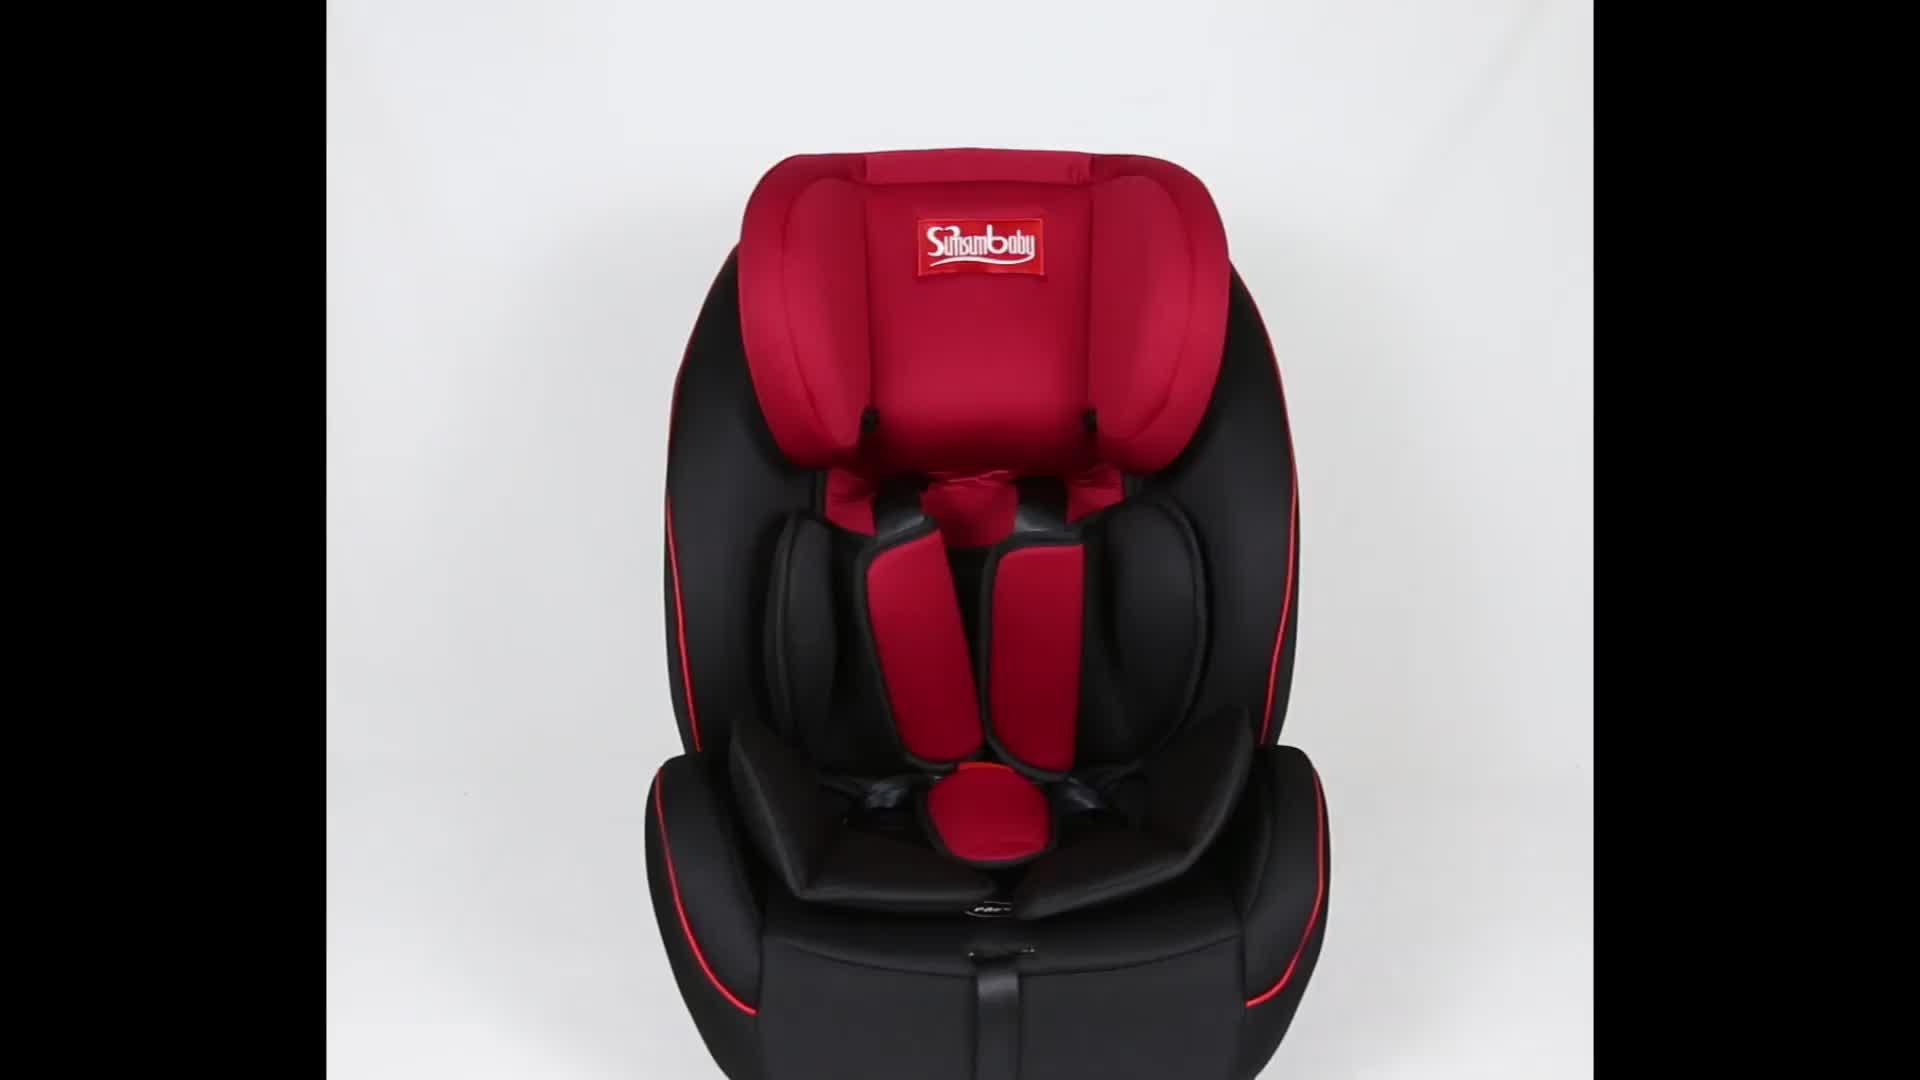 Opvouwbare Reizen Veiligheid Peuter Rear Facing Peuter Convertible Booster Stoel Kind Zuigeling Kids Baby-autozitje